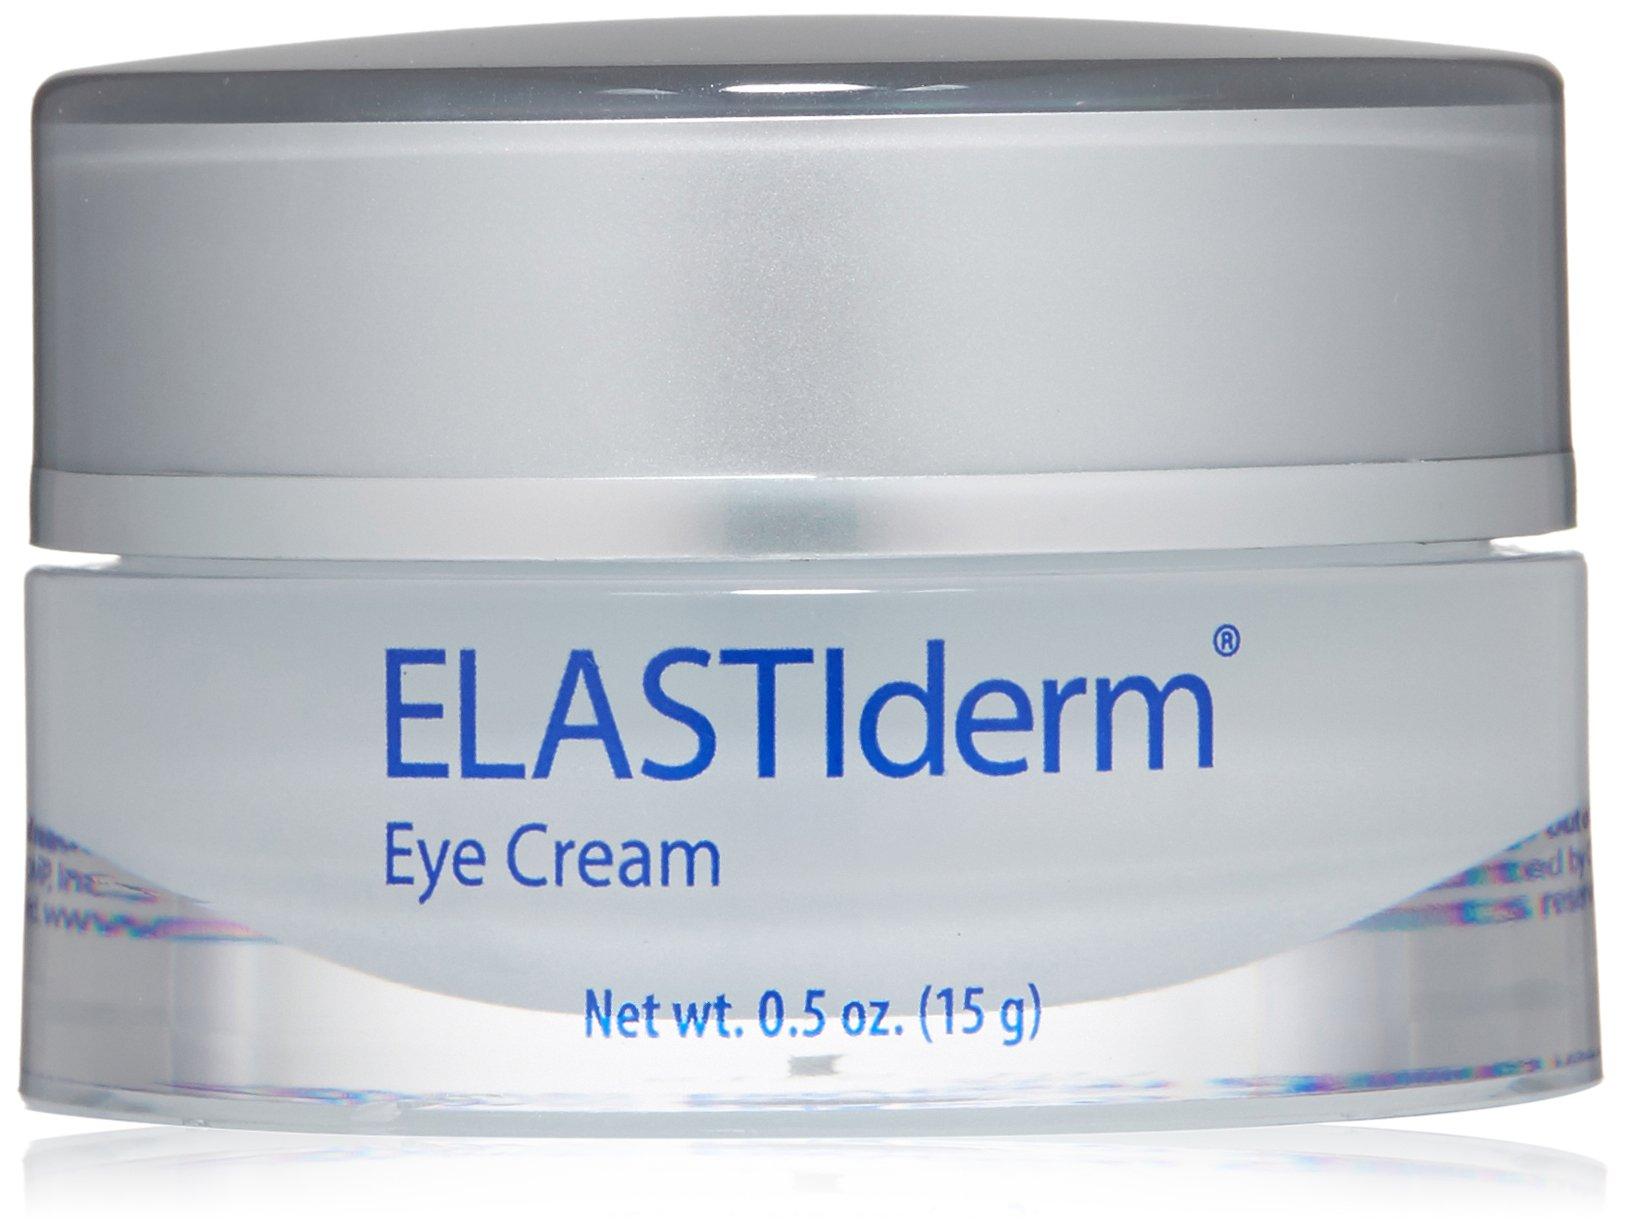 Obagi ELASTIderm Eye Cream, 0.5 oz by Obagi Medical